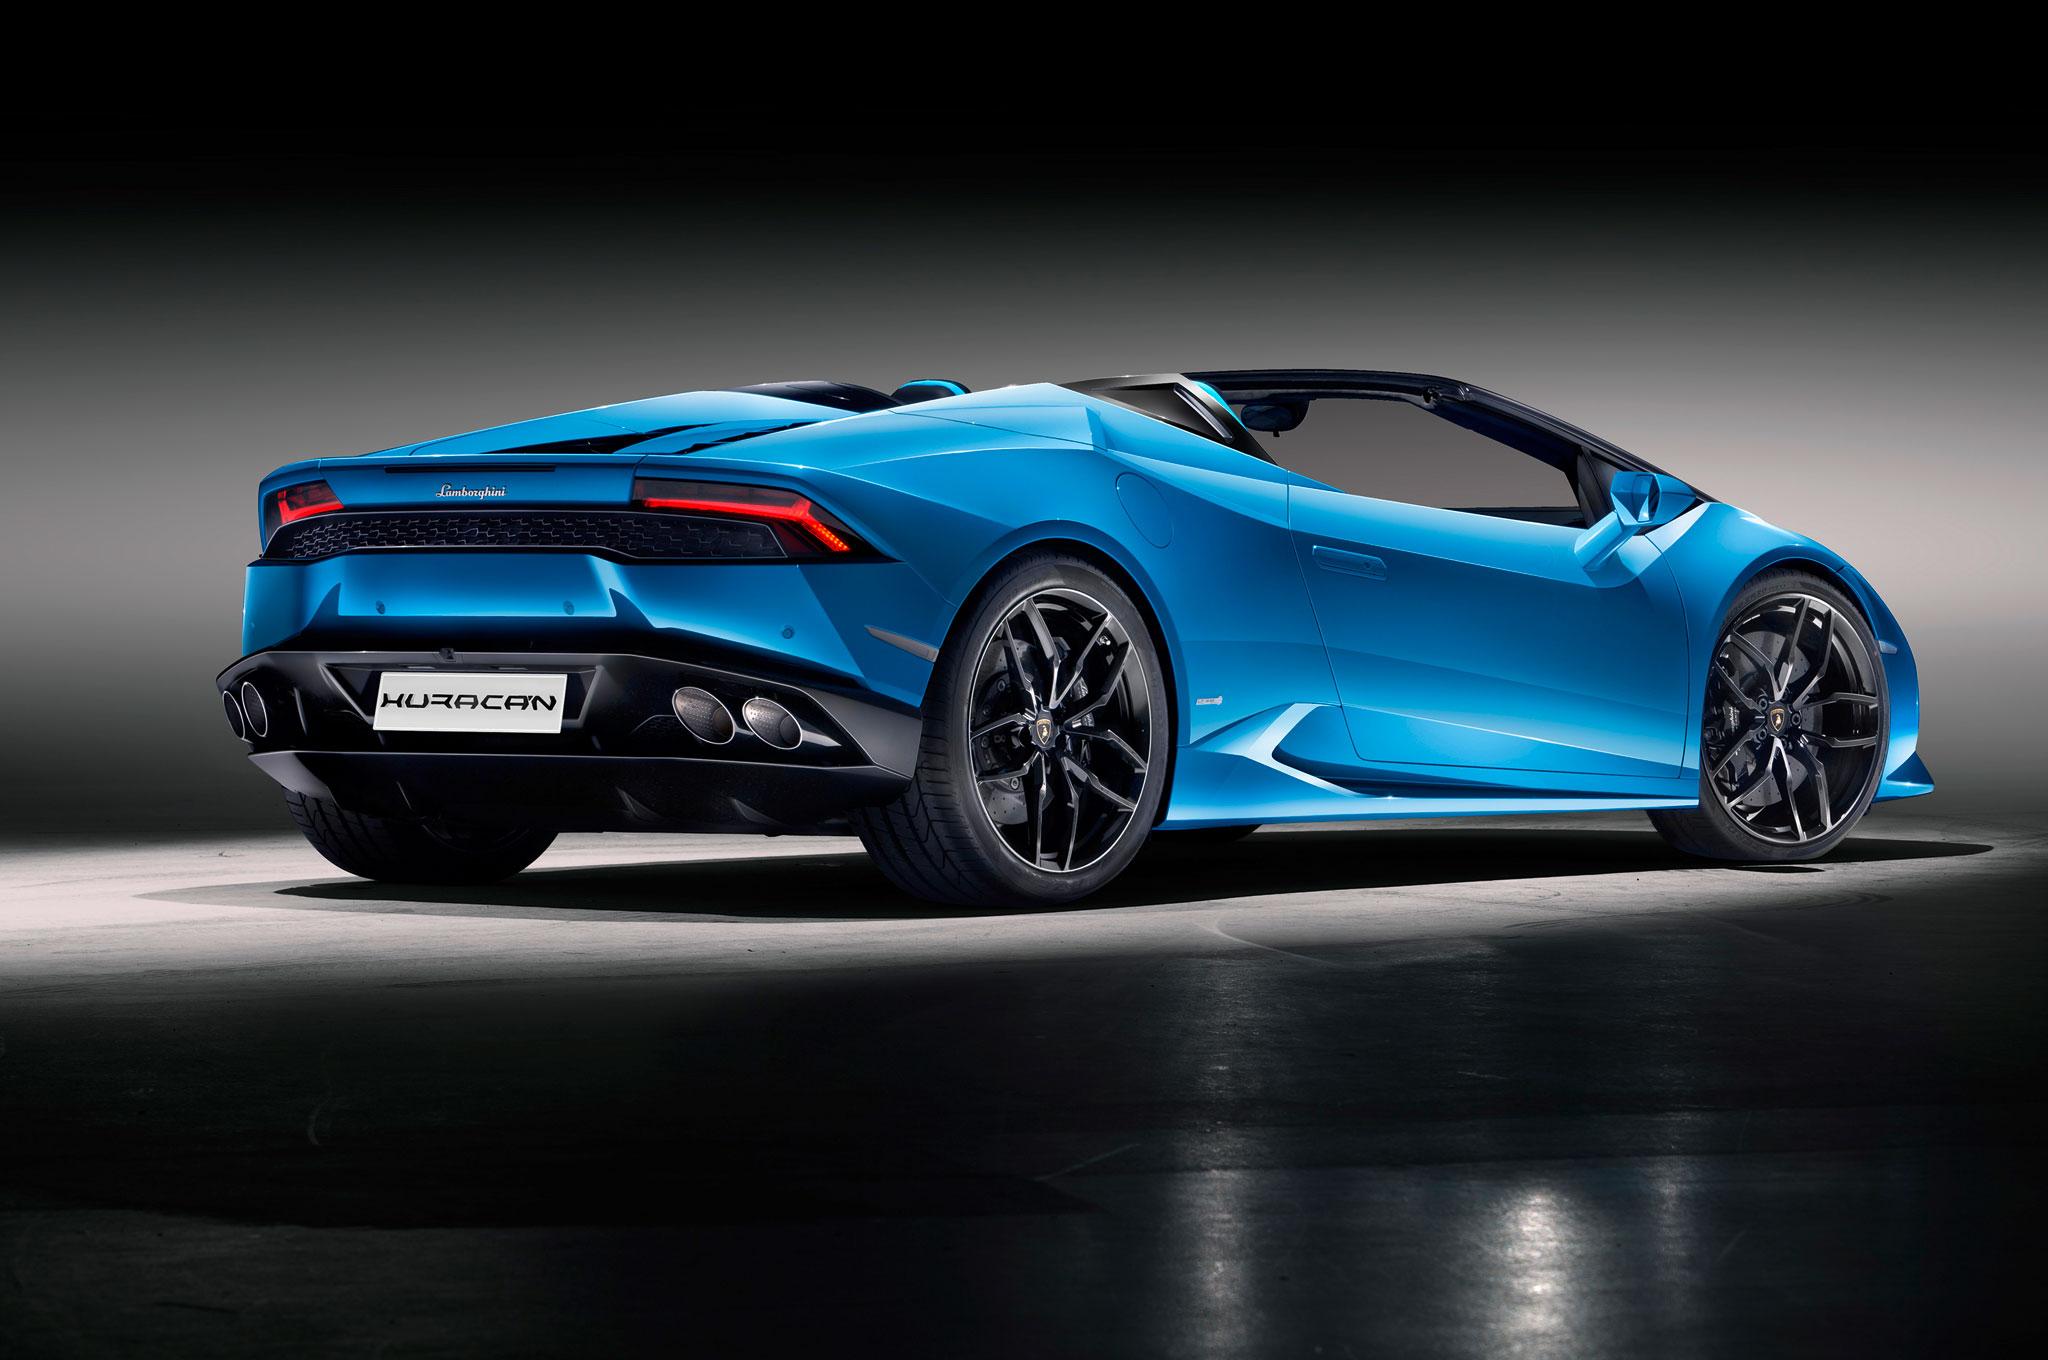 Lamborghini Huracan Spyder Rear Side View Motor Trend En Espanol